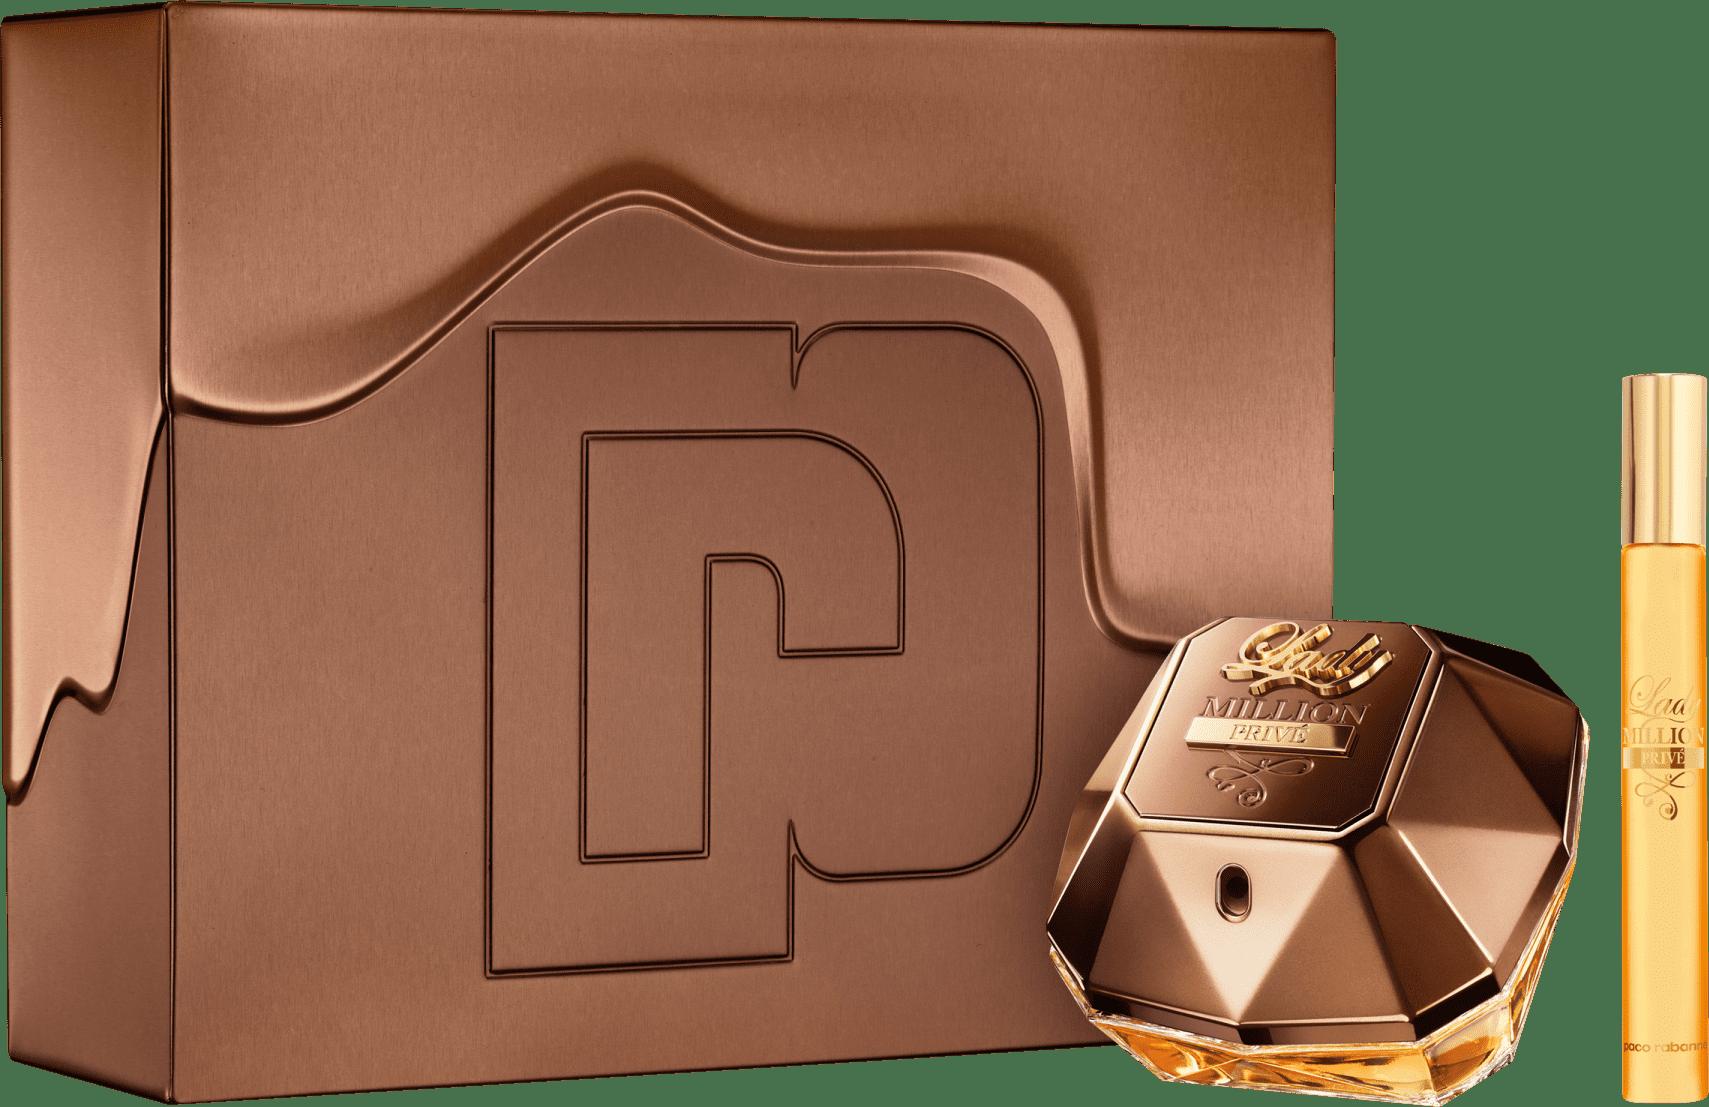 f3ccb4e8fa Conjunto Lady Million Privé Duo Paco Rabanne Feminino - Eau de Parfum 80ml  + Travel Size